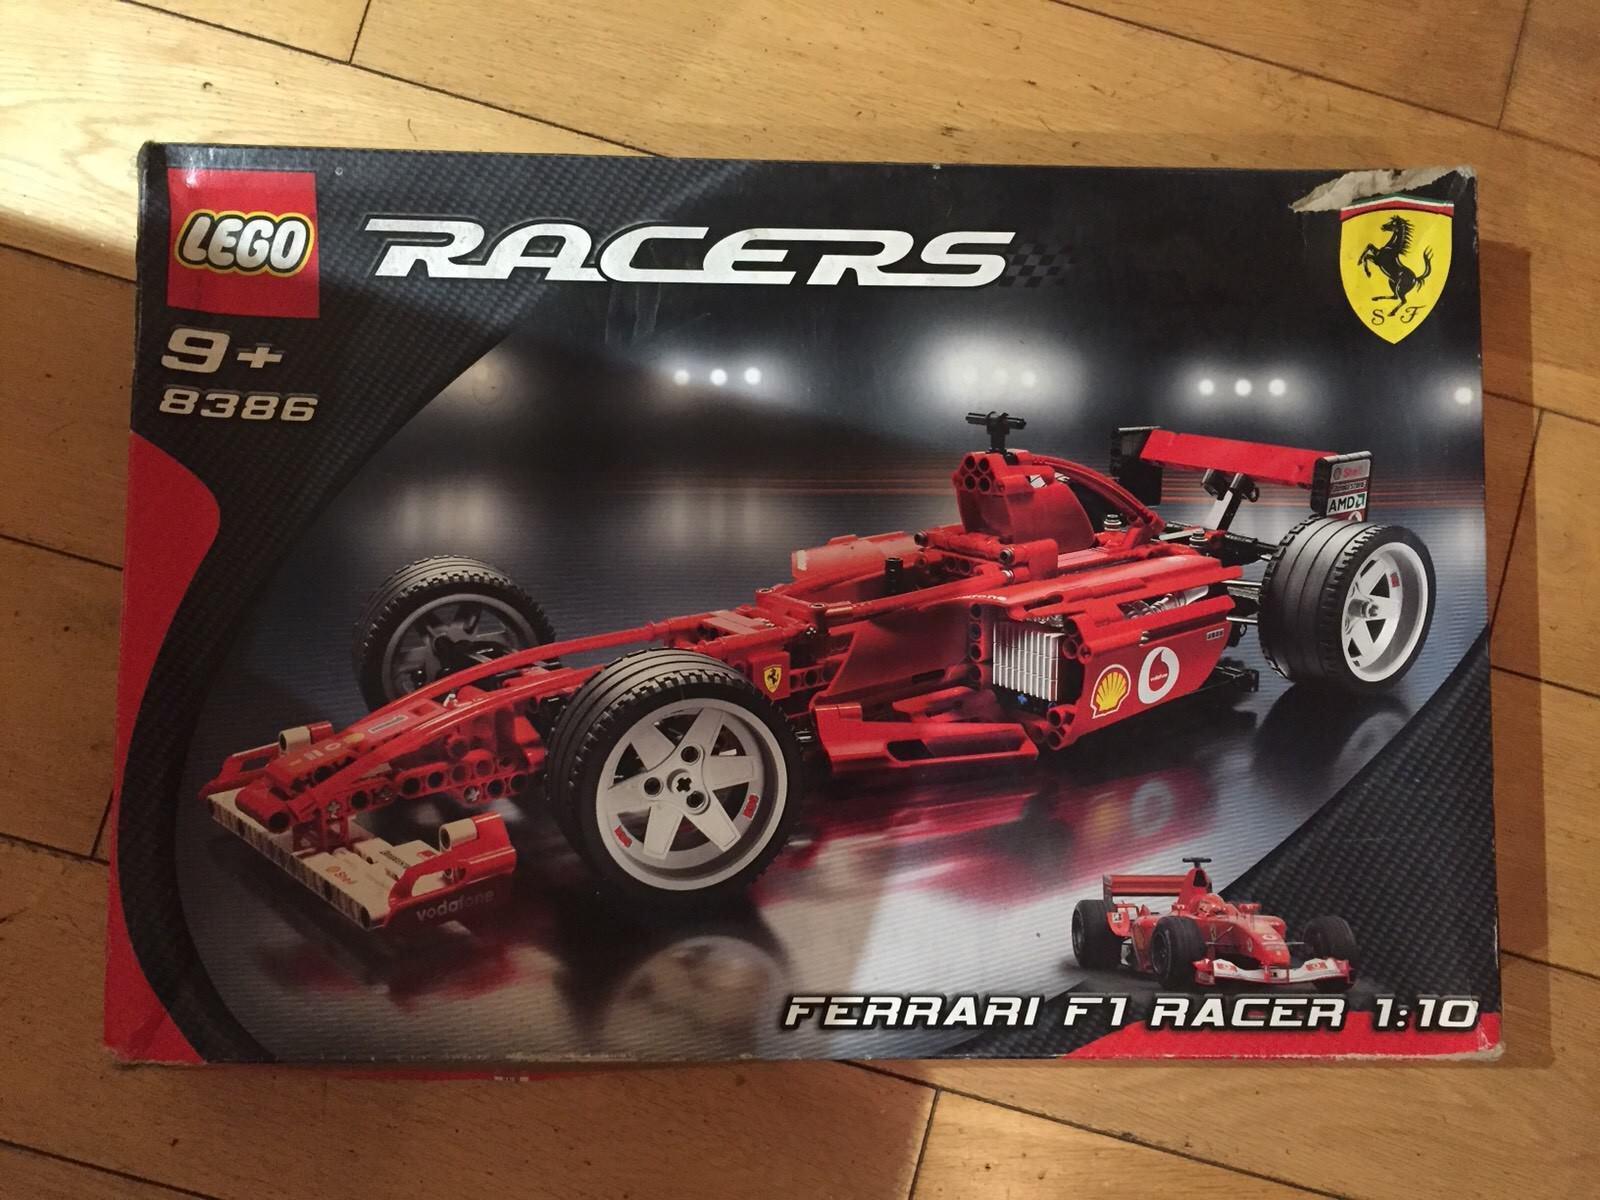 LEGO Ferrari F1 Racers 8386 1 10 scale scale 10 Collectors Item - BOXED - UNUSED 2c9bf7